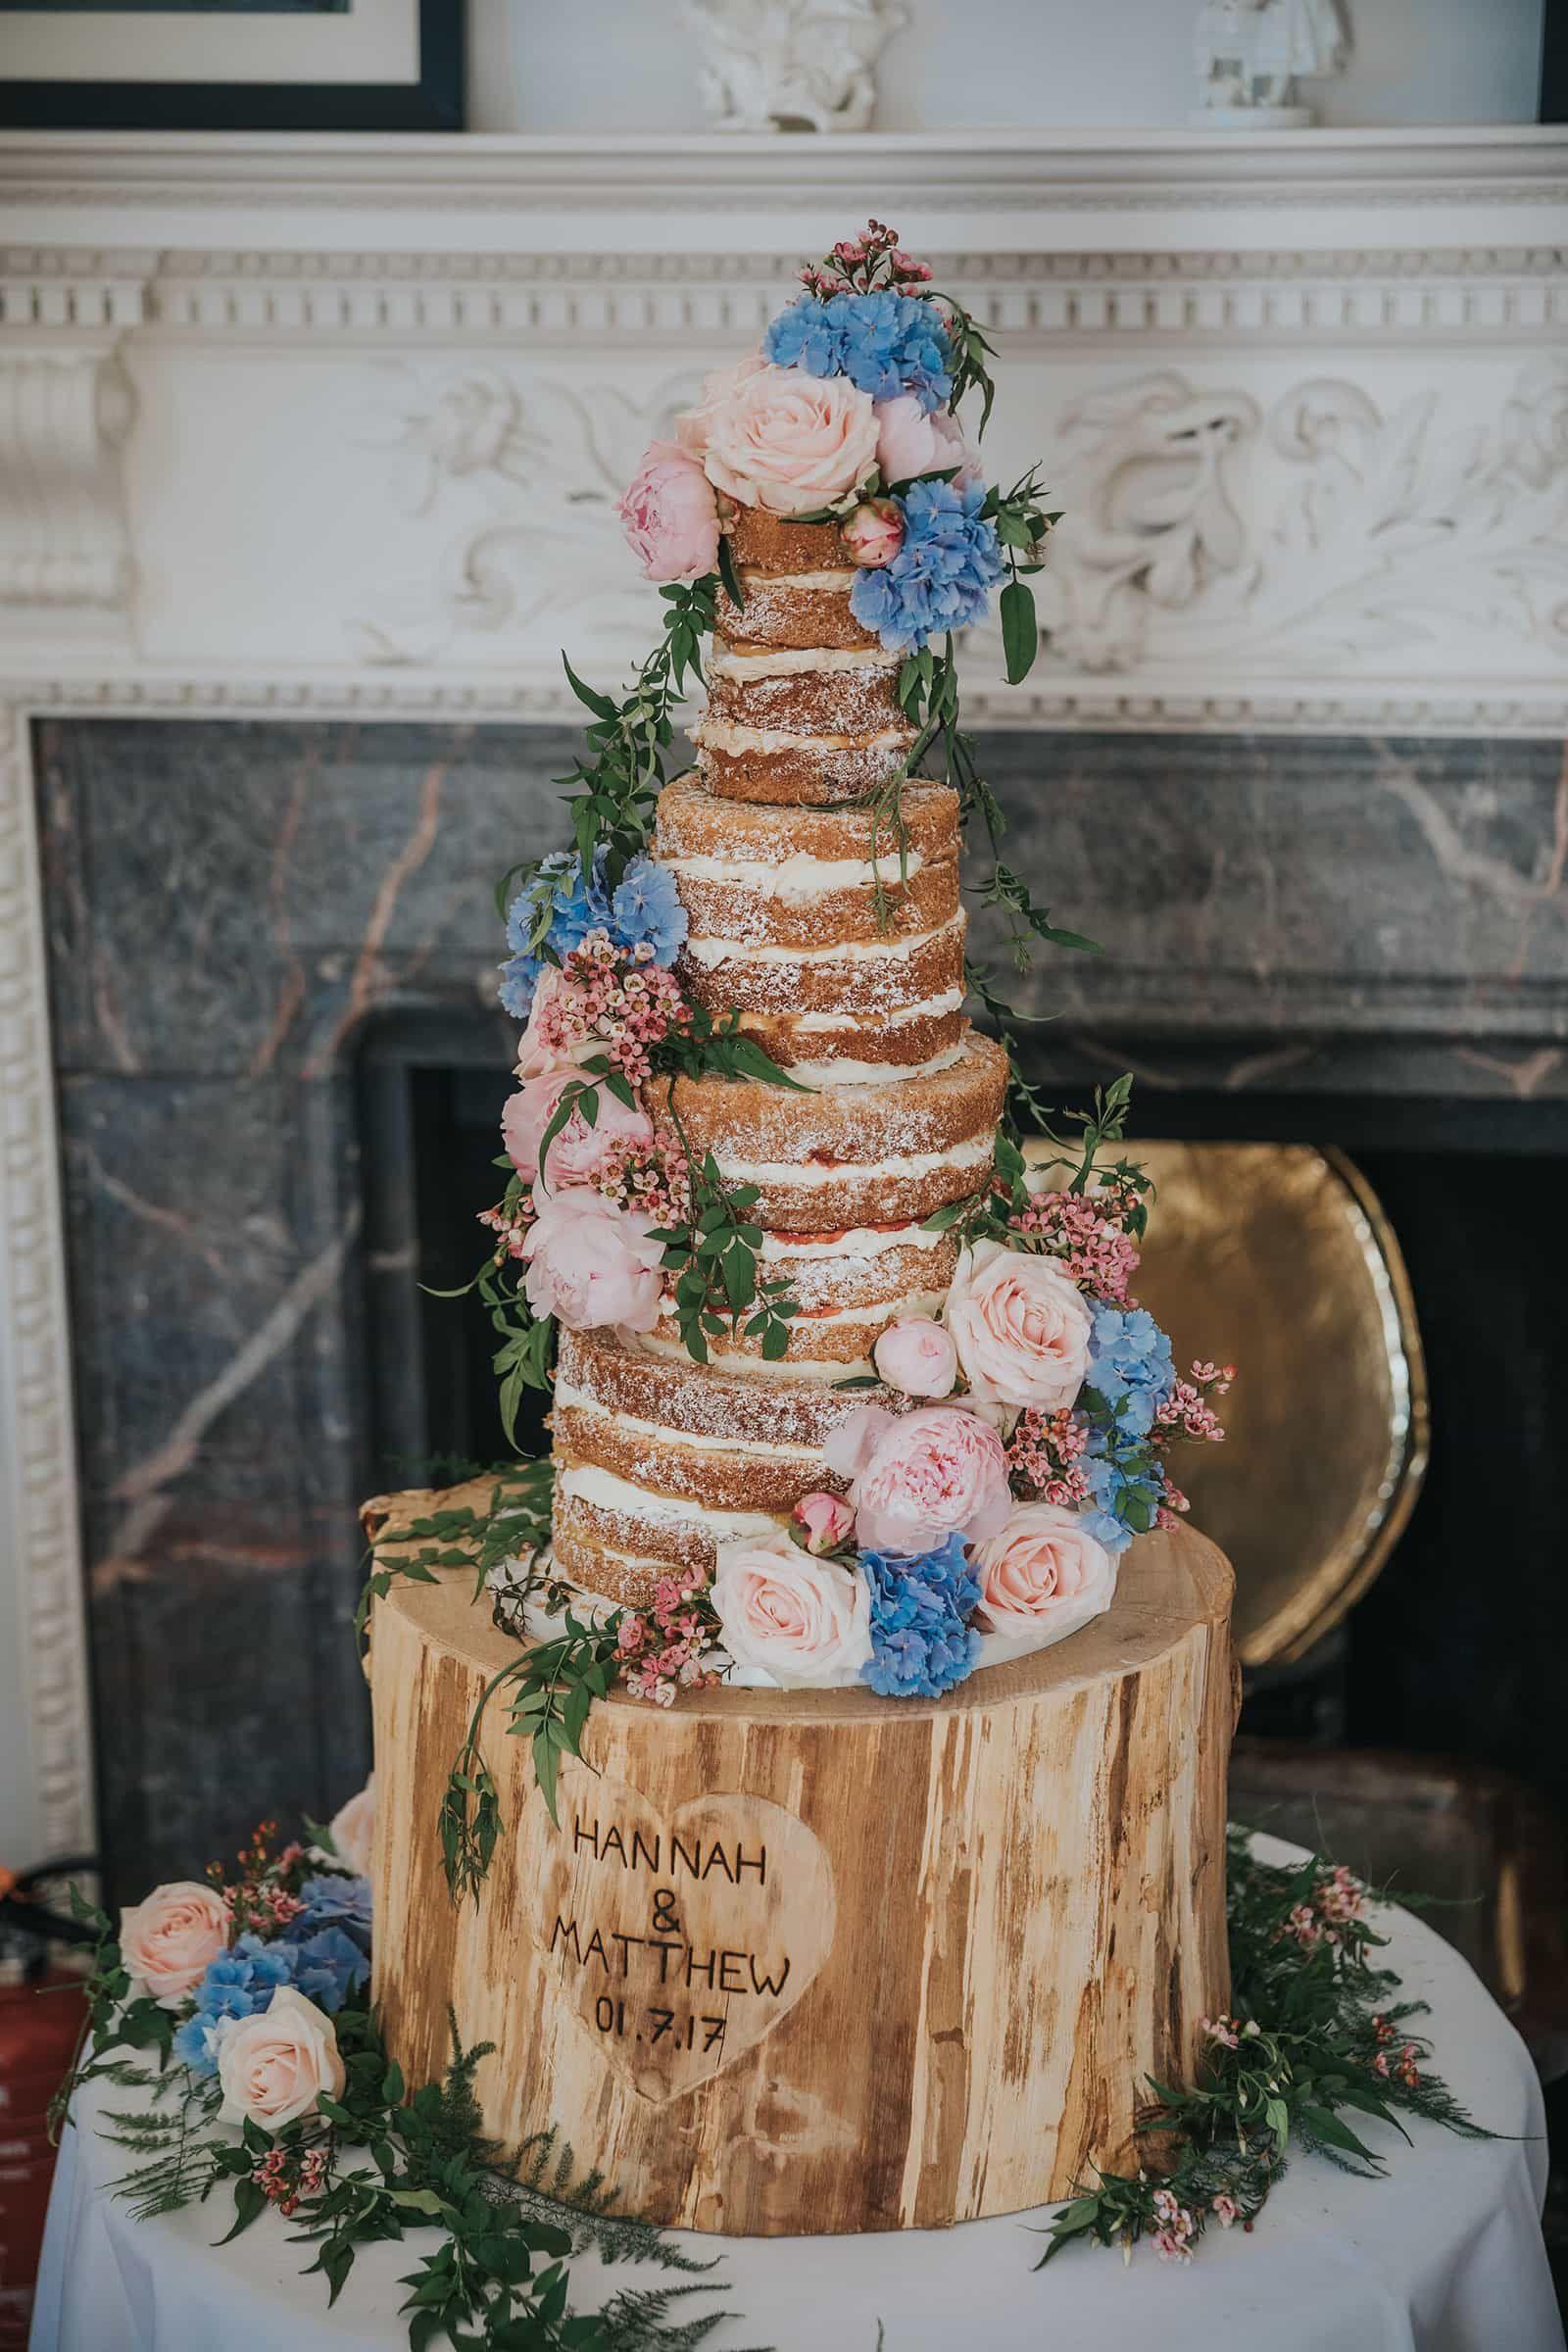 Edible essence cake art cake art wedding cakes butter